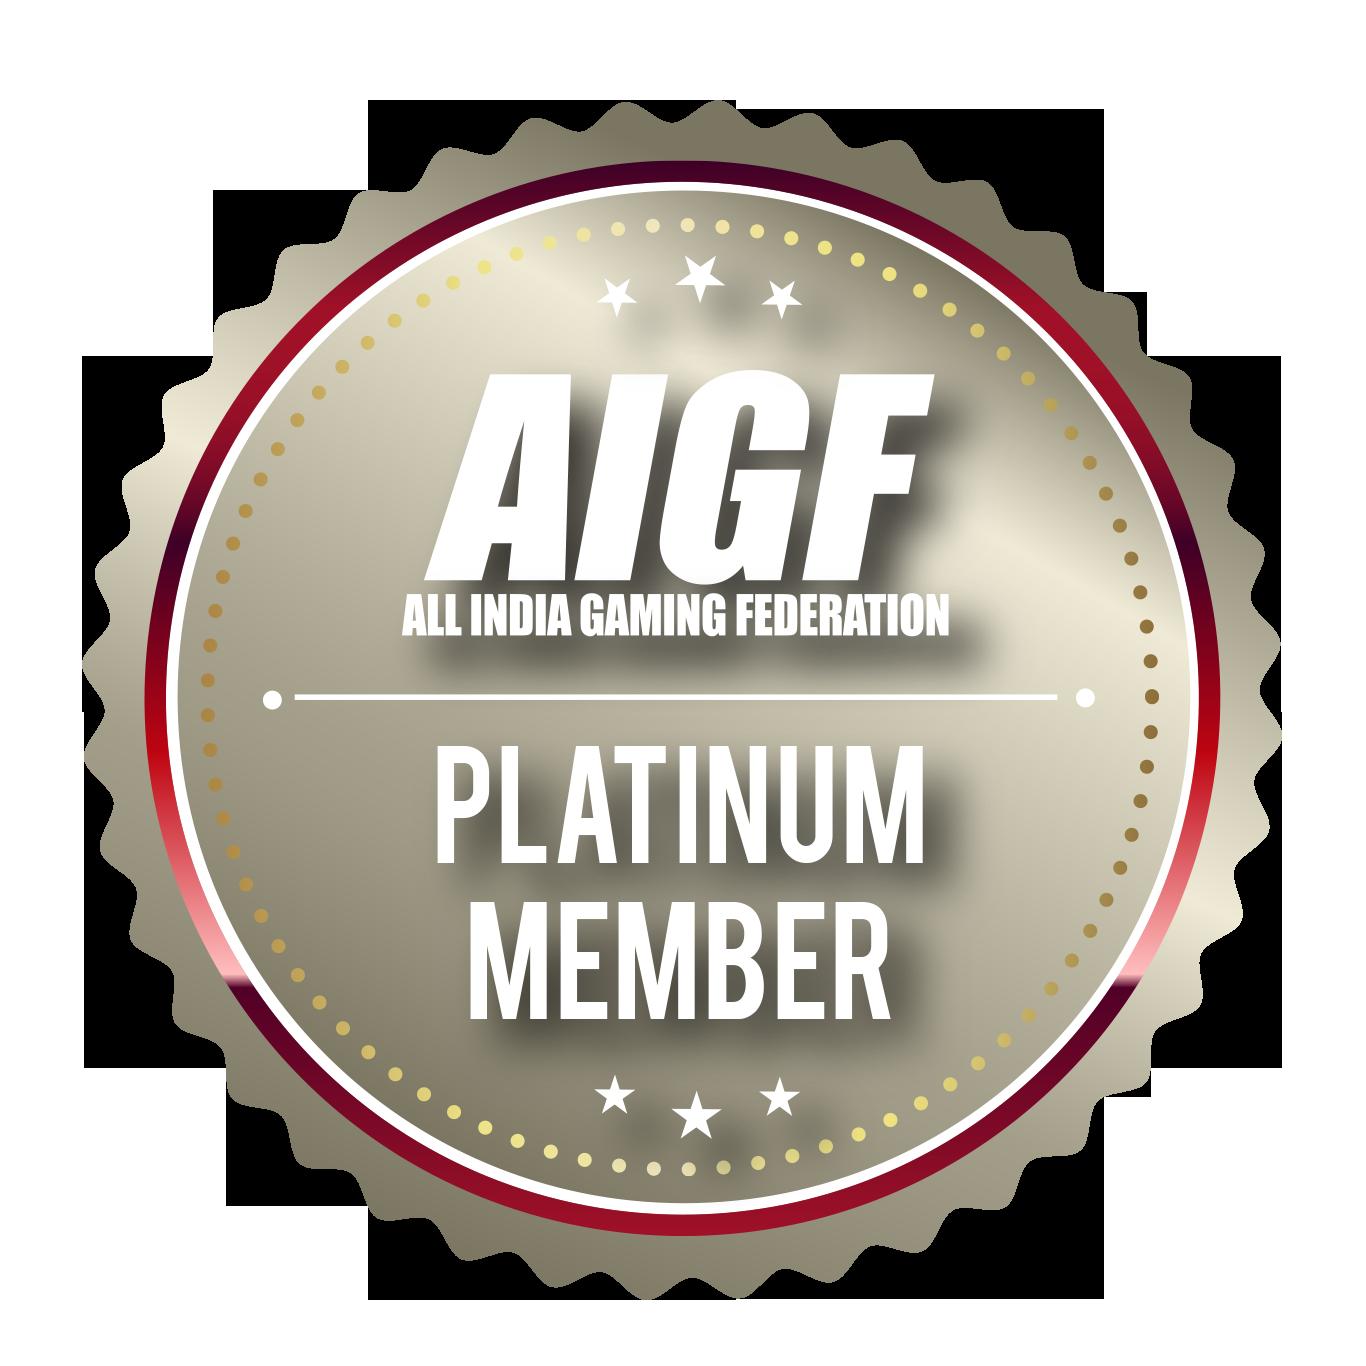 All India Gaming Federation (AIGF)